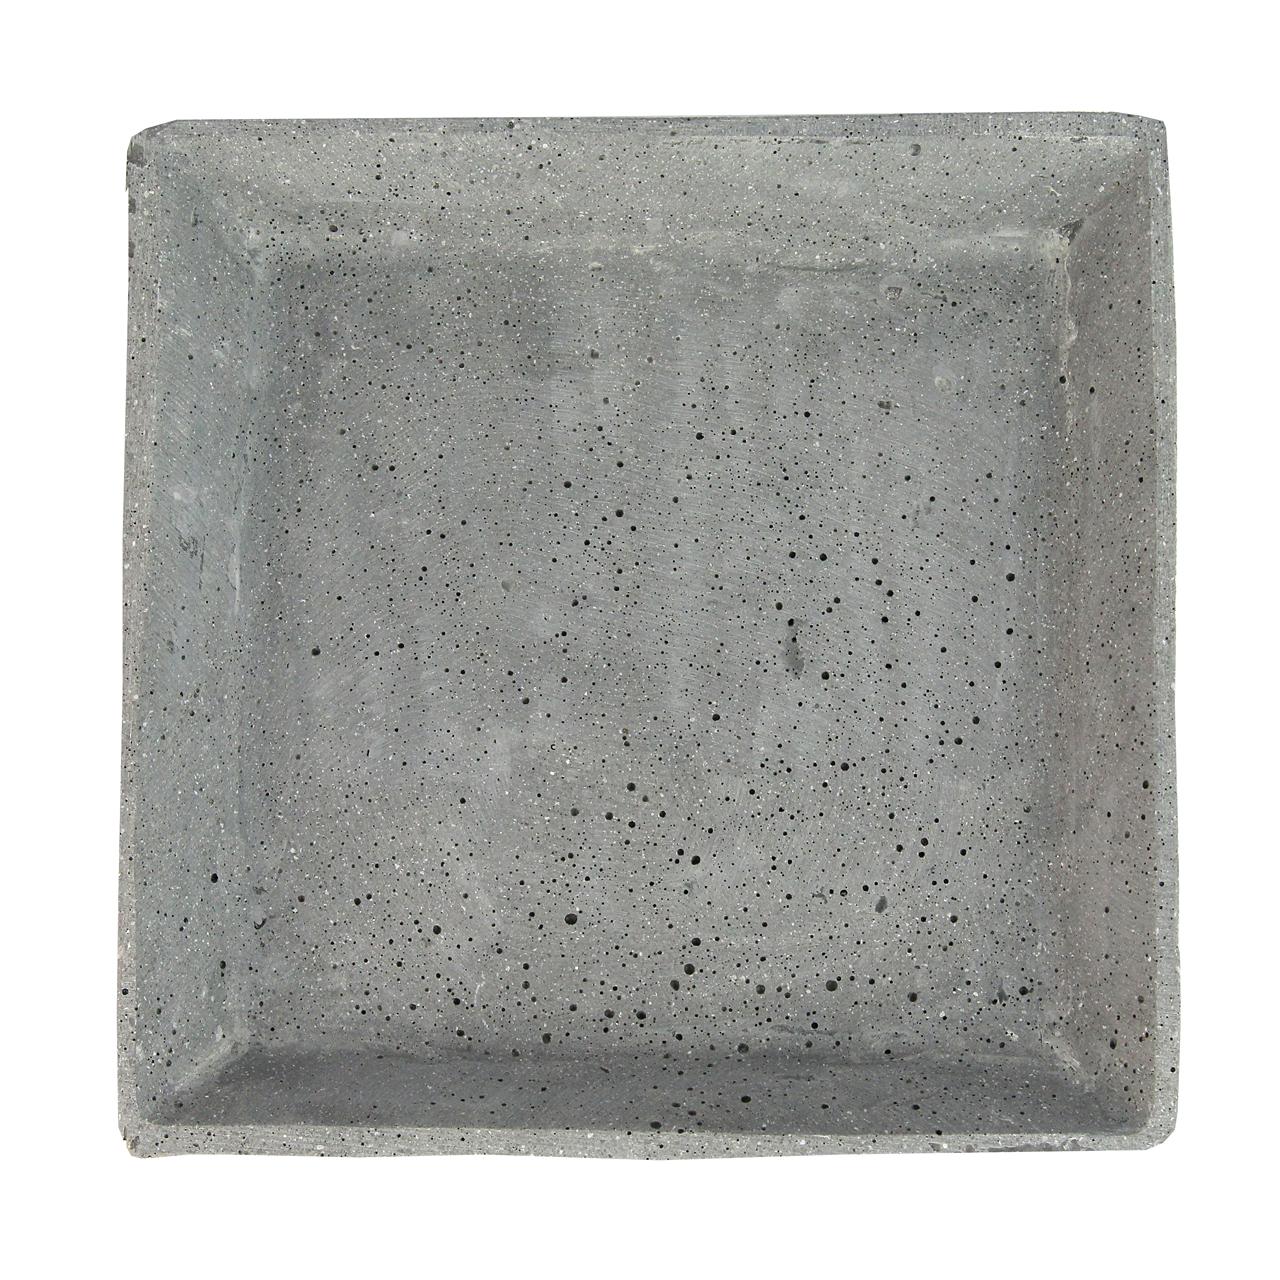 Tava Din Ciment Gri 25 Cm